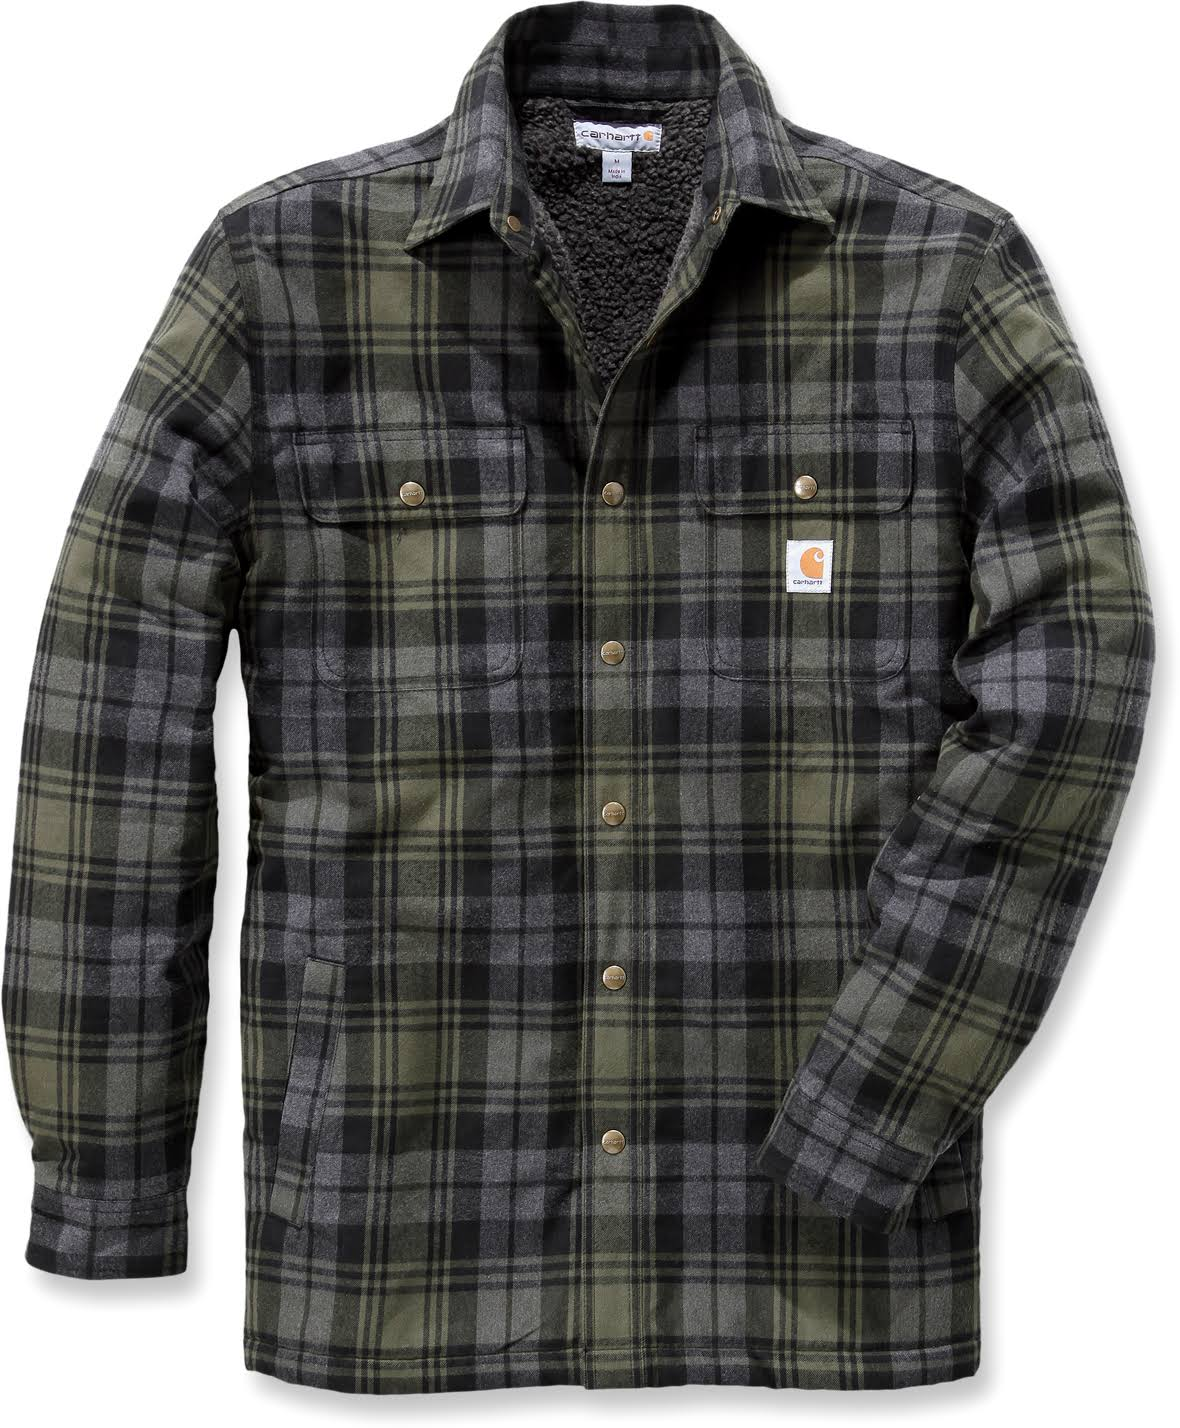 Sherpa De X Forrada Camisa Hubbard Grande Carhartt Ropa Trabajo Musgo q1xOIx